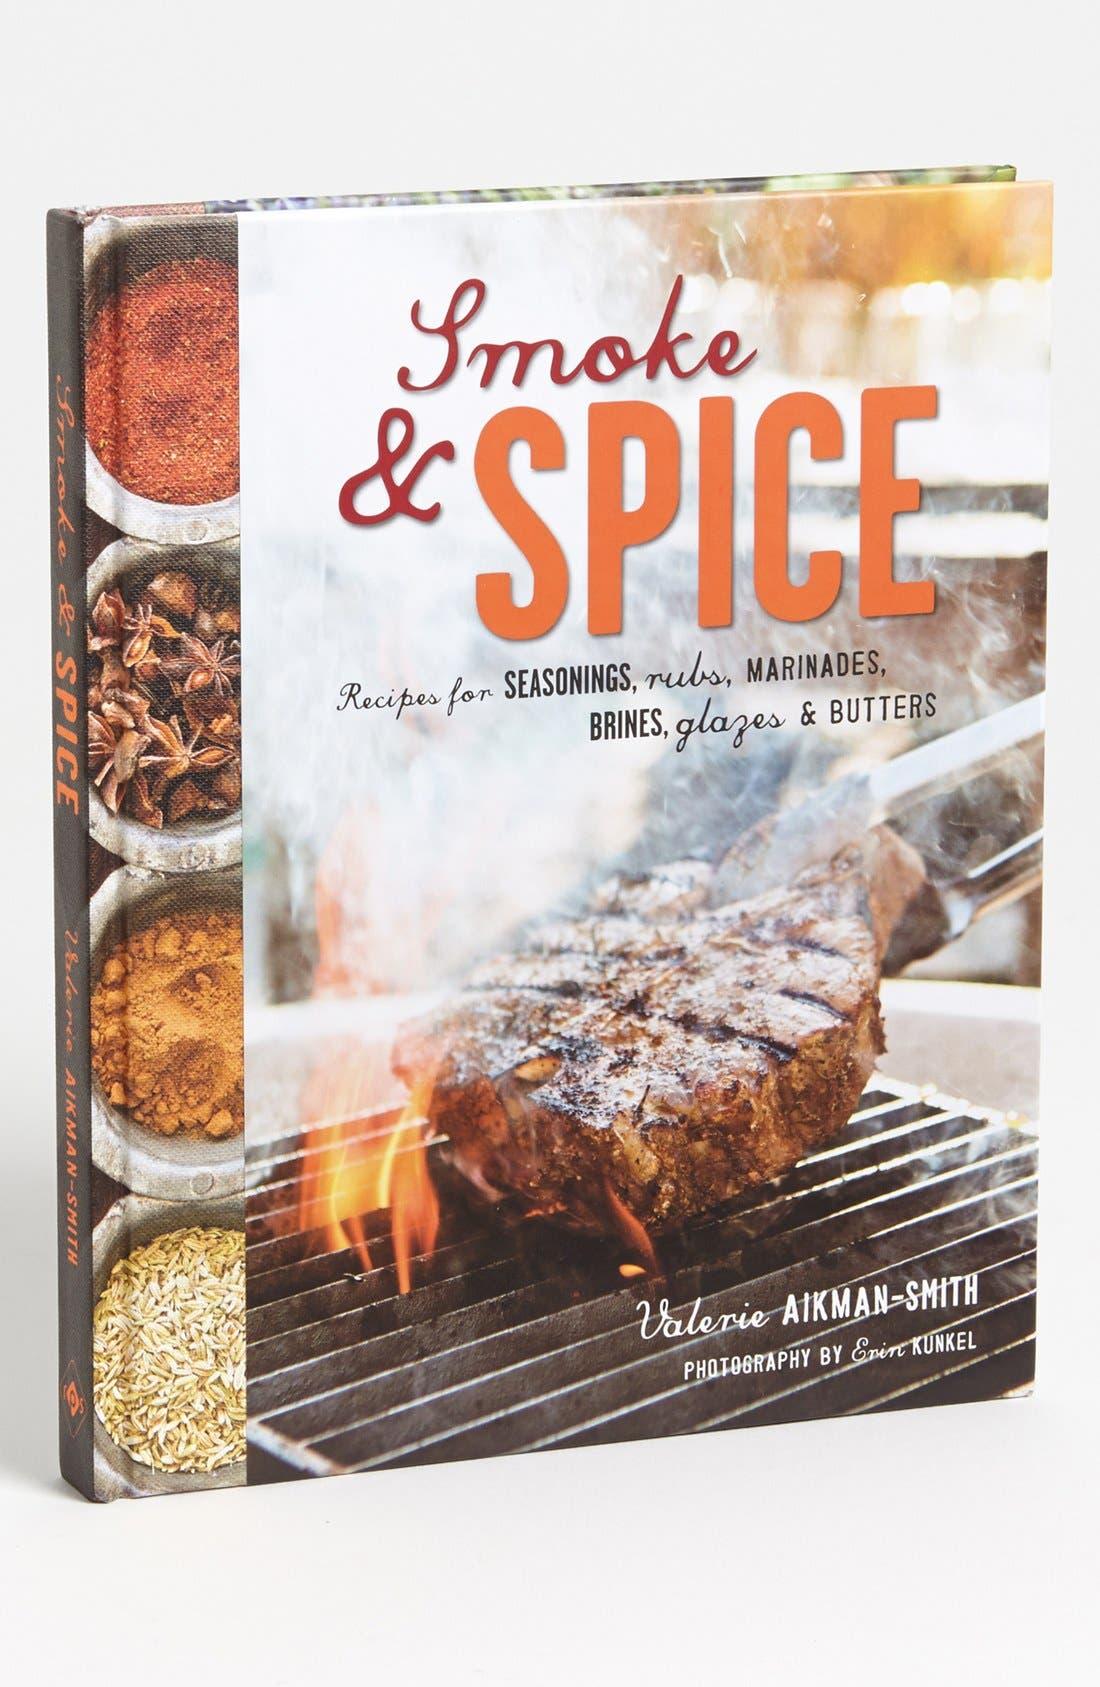 Alternate Image 1 Selected - 'Smoke & Spice' Cookbook